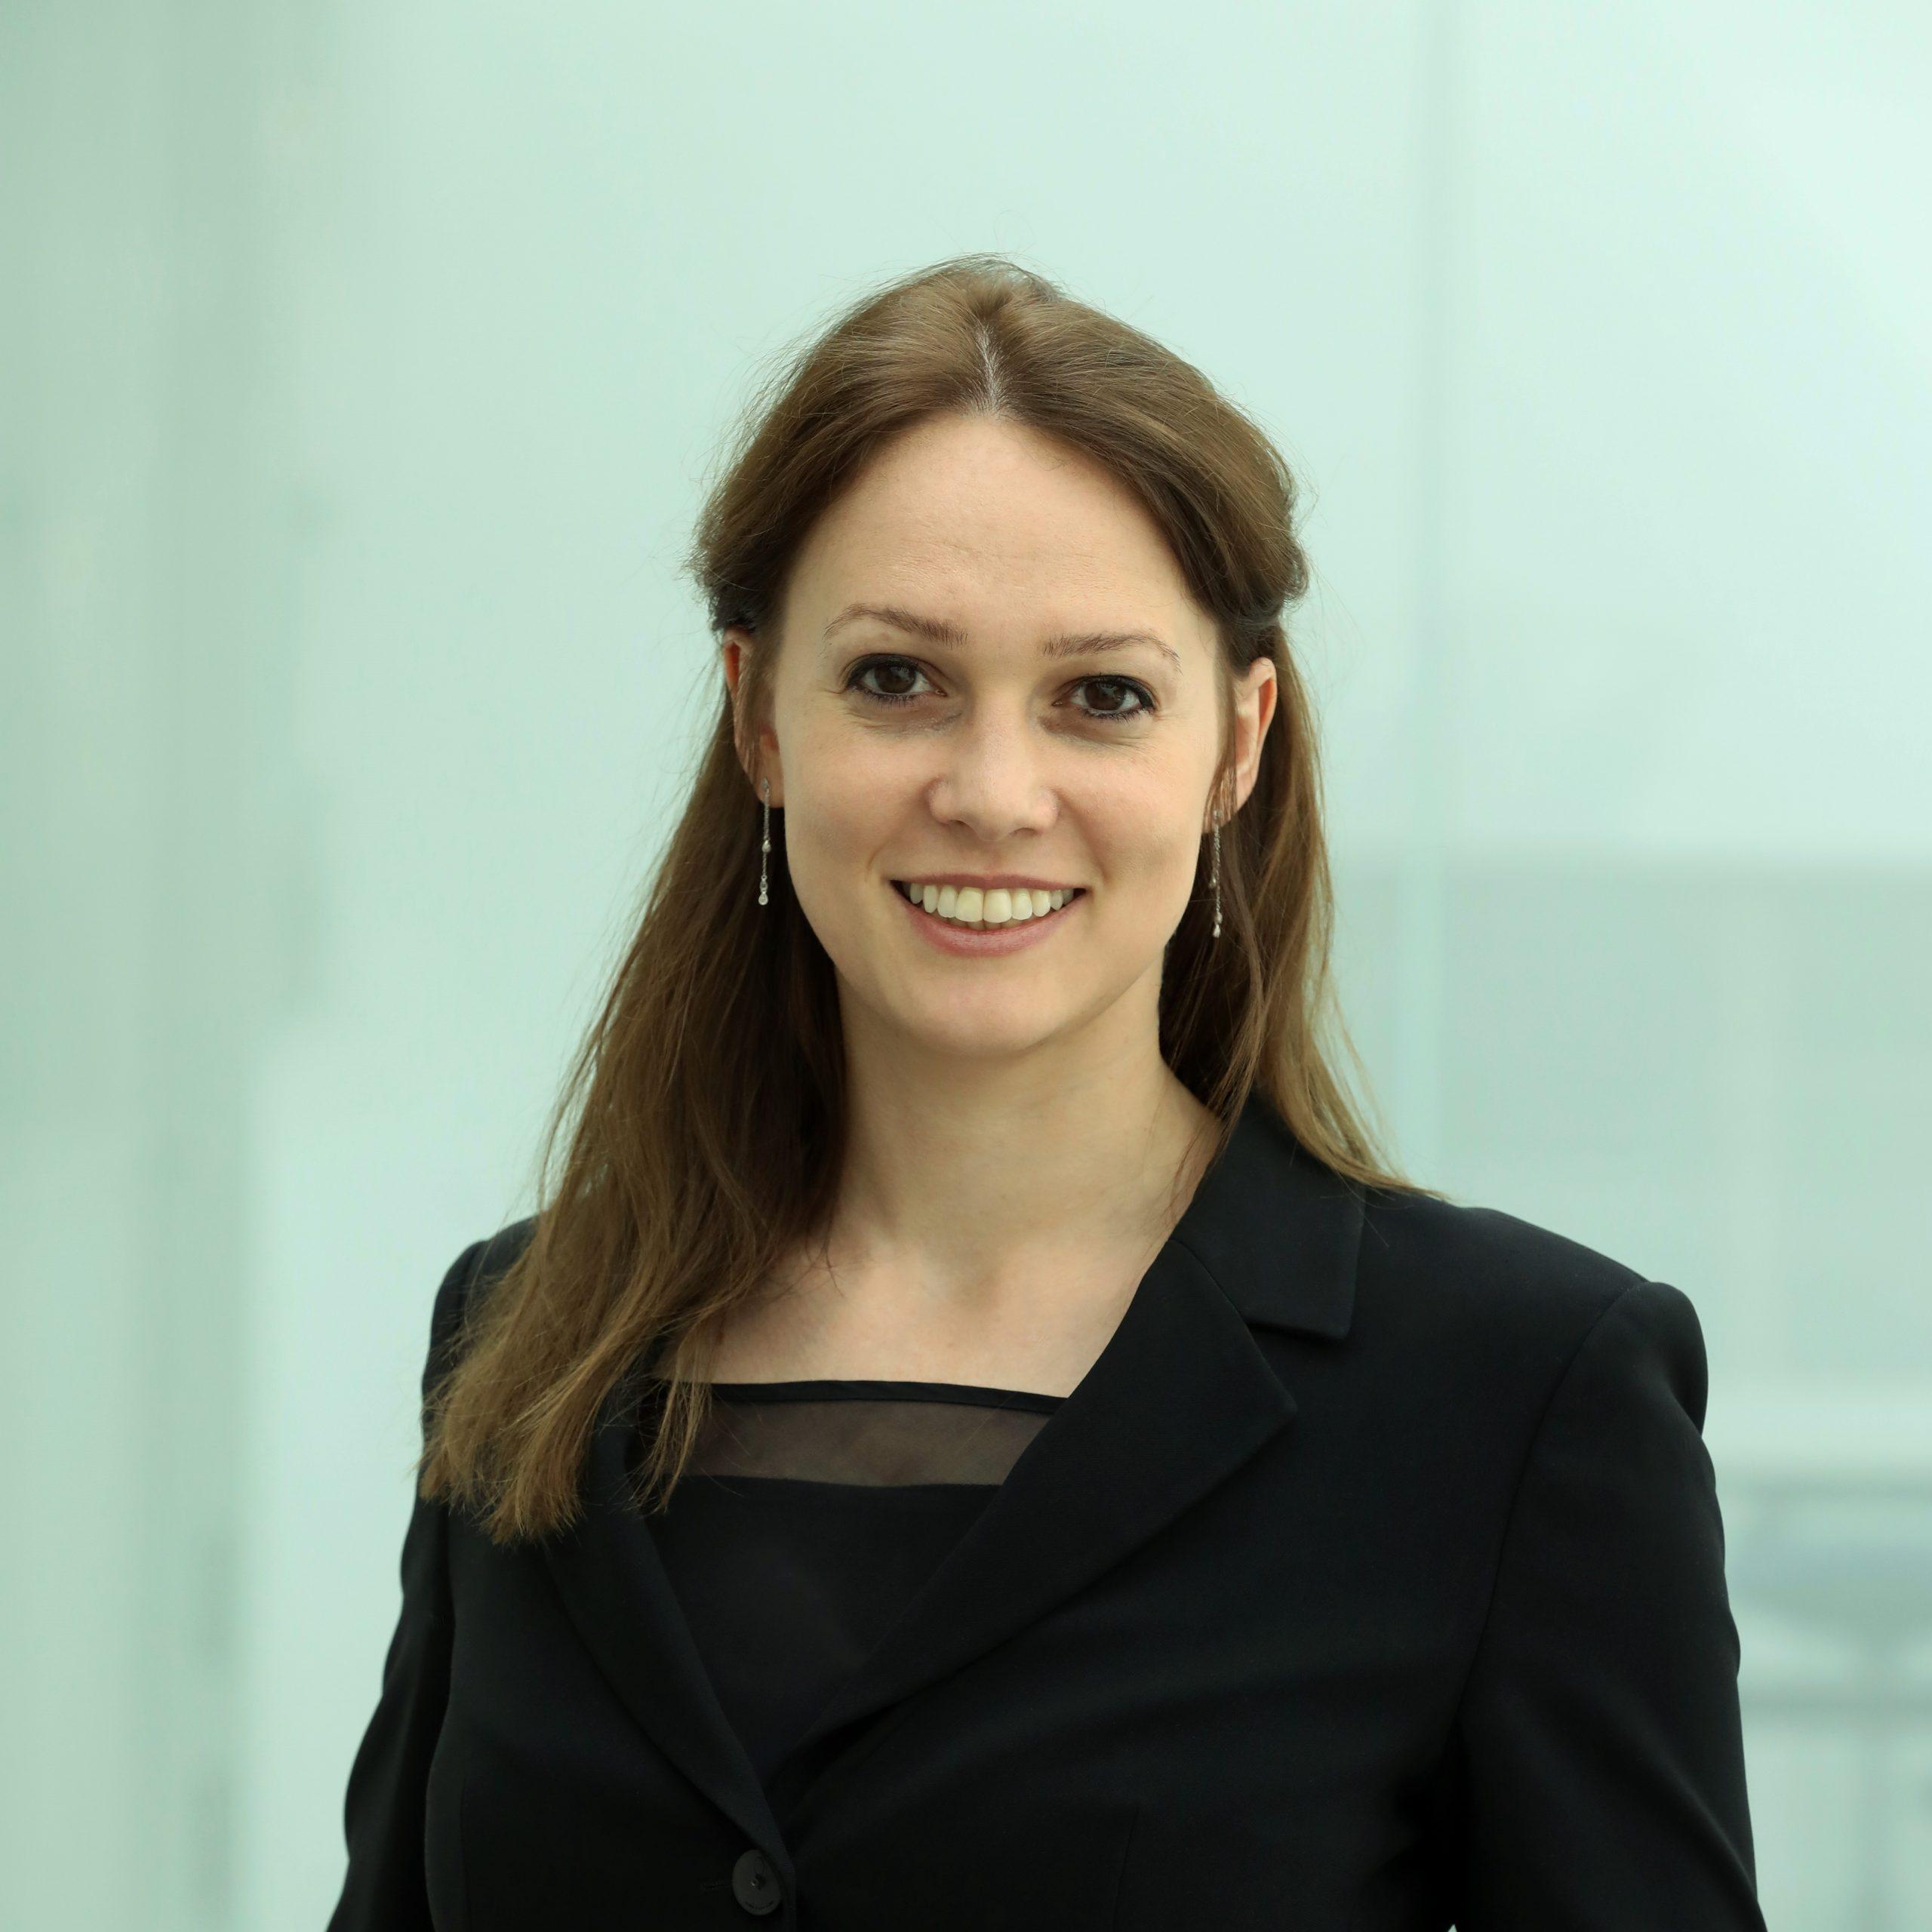 Faten Gaber, Head of Communication & Public Affairs, Roche